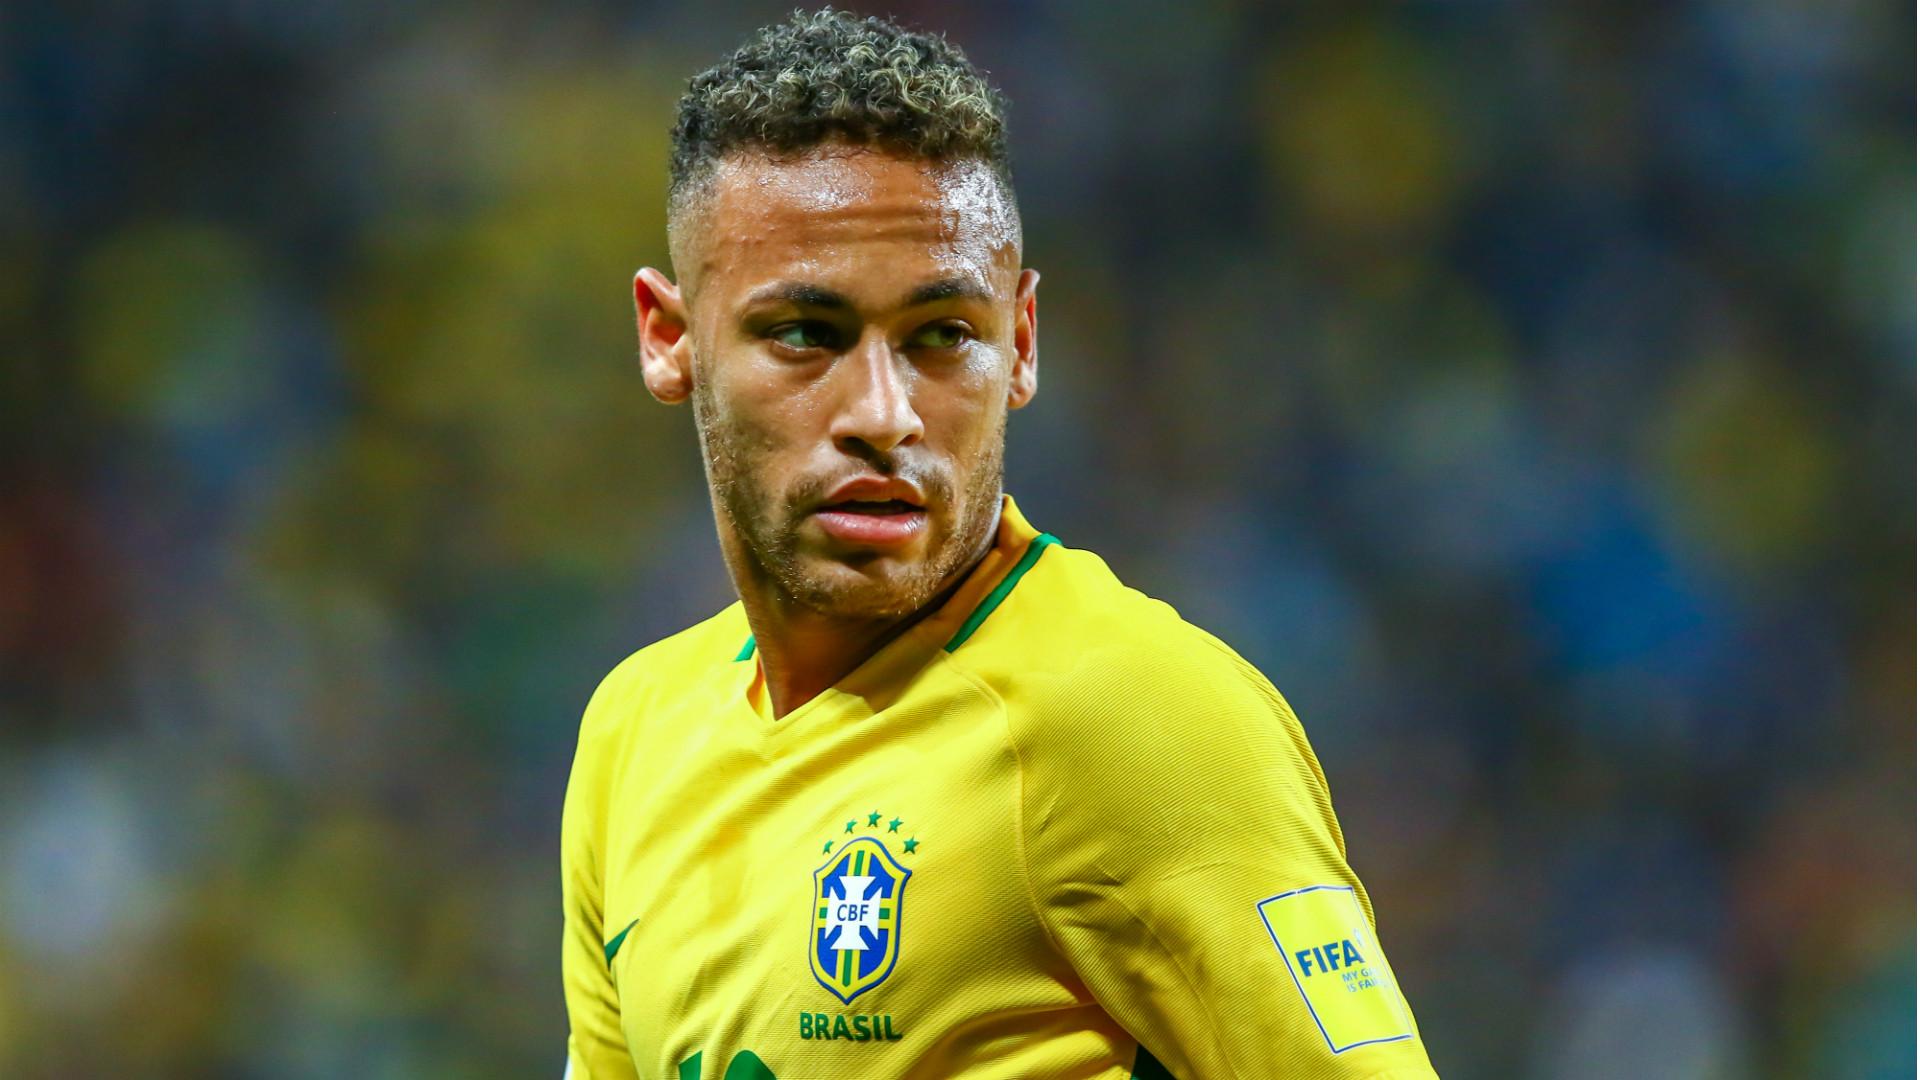 Most Inspiring Brazil World Cup 2018 - neymar-brazil_14pog467nu2qt19ww3p14h1aew  Photograph_655875 .jpg?t\u003d-557307218